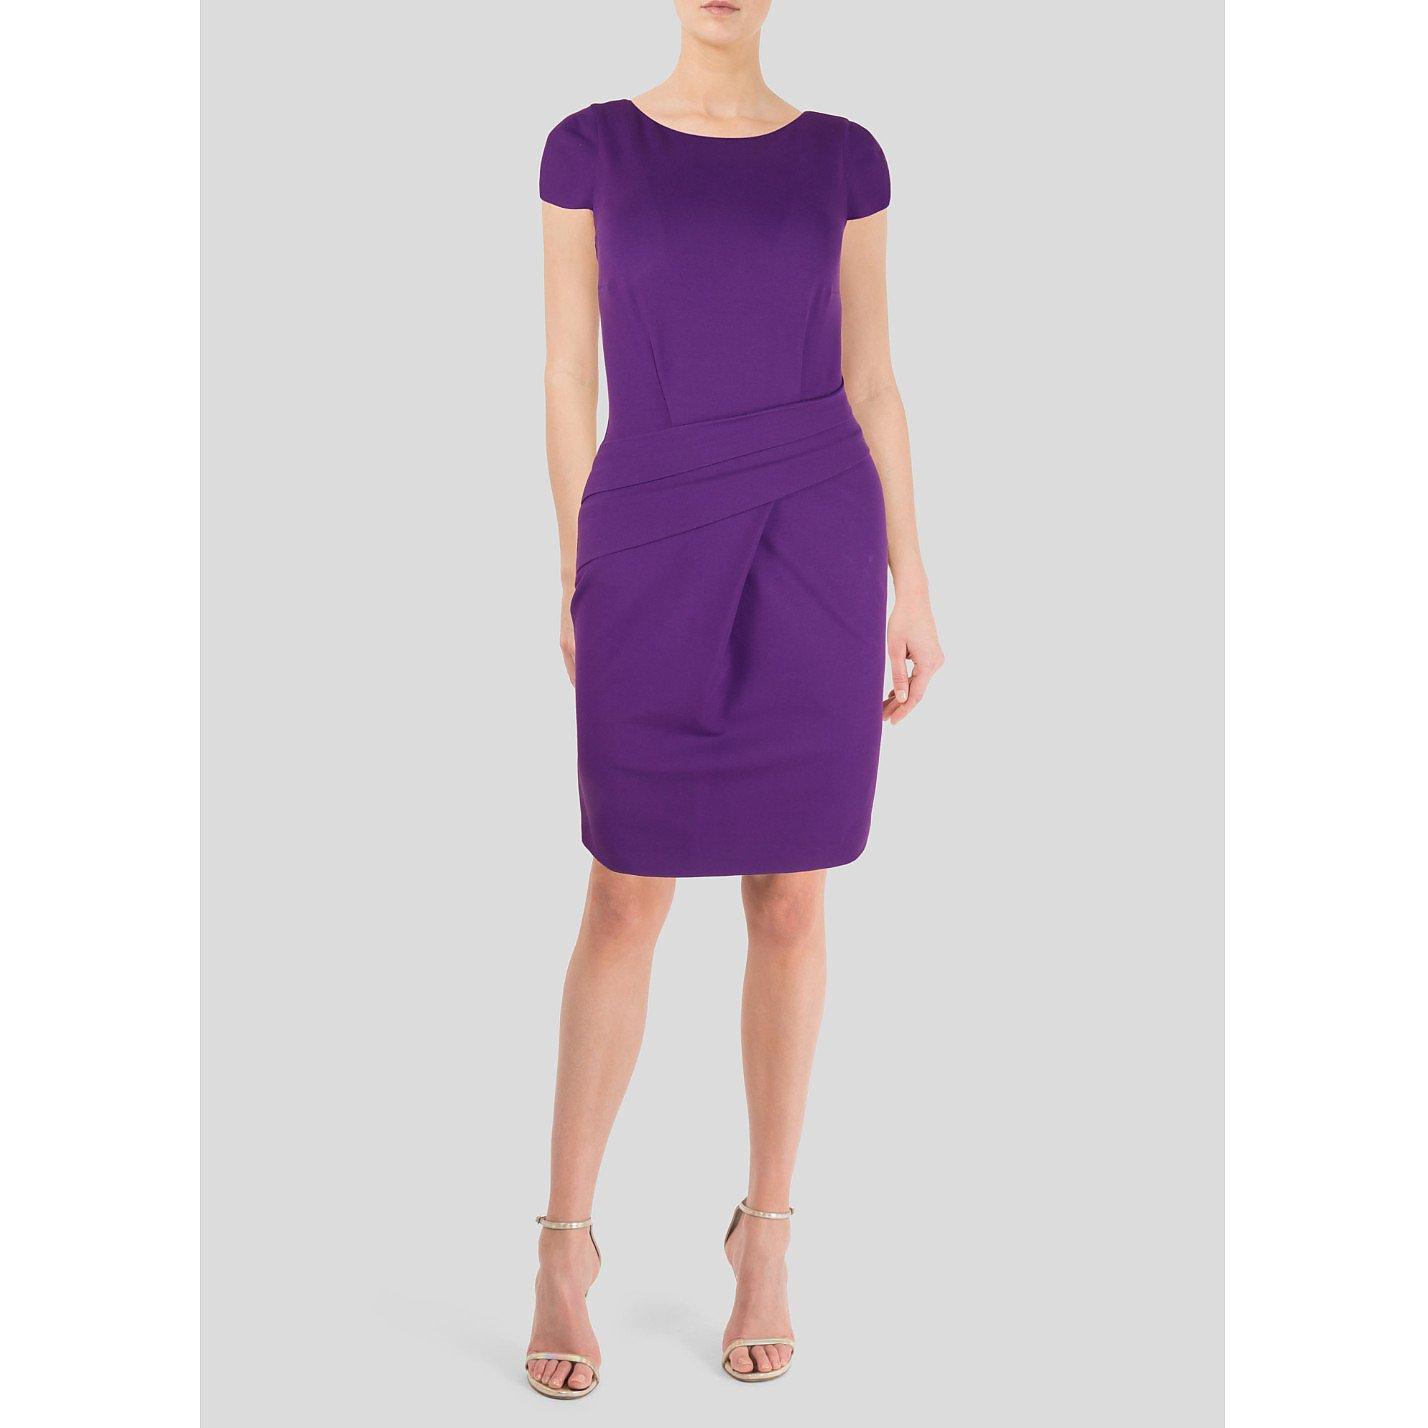 Michael Kors Fitted Short Sleeve Dress